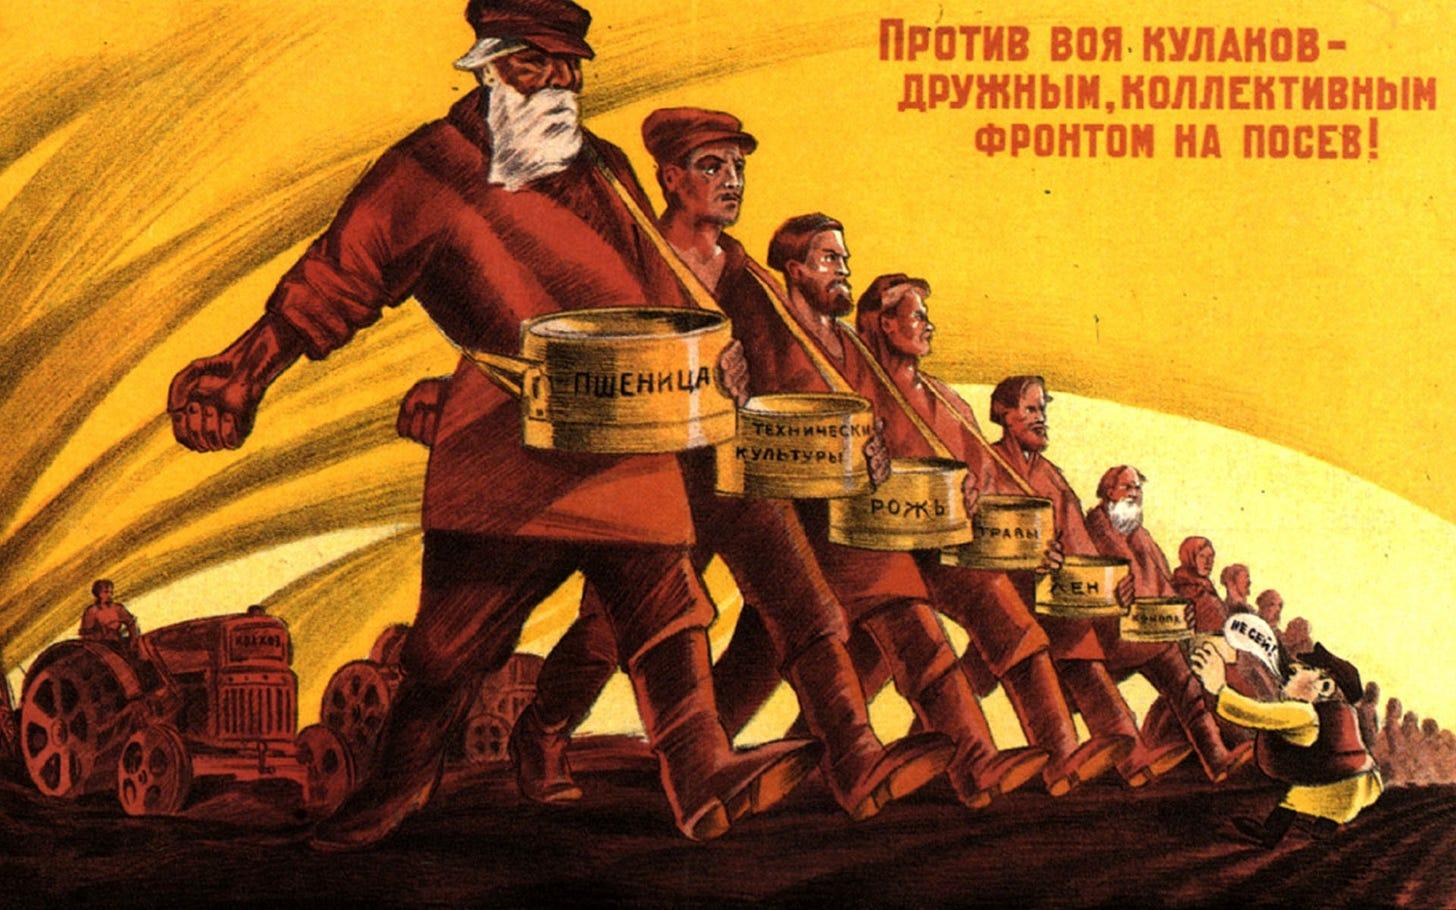 Soviet-Union-propaganda-1920×1200 | Sean Moloney: Fine Art